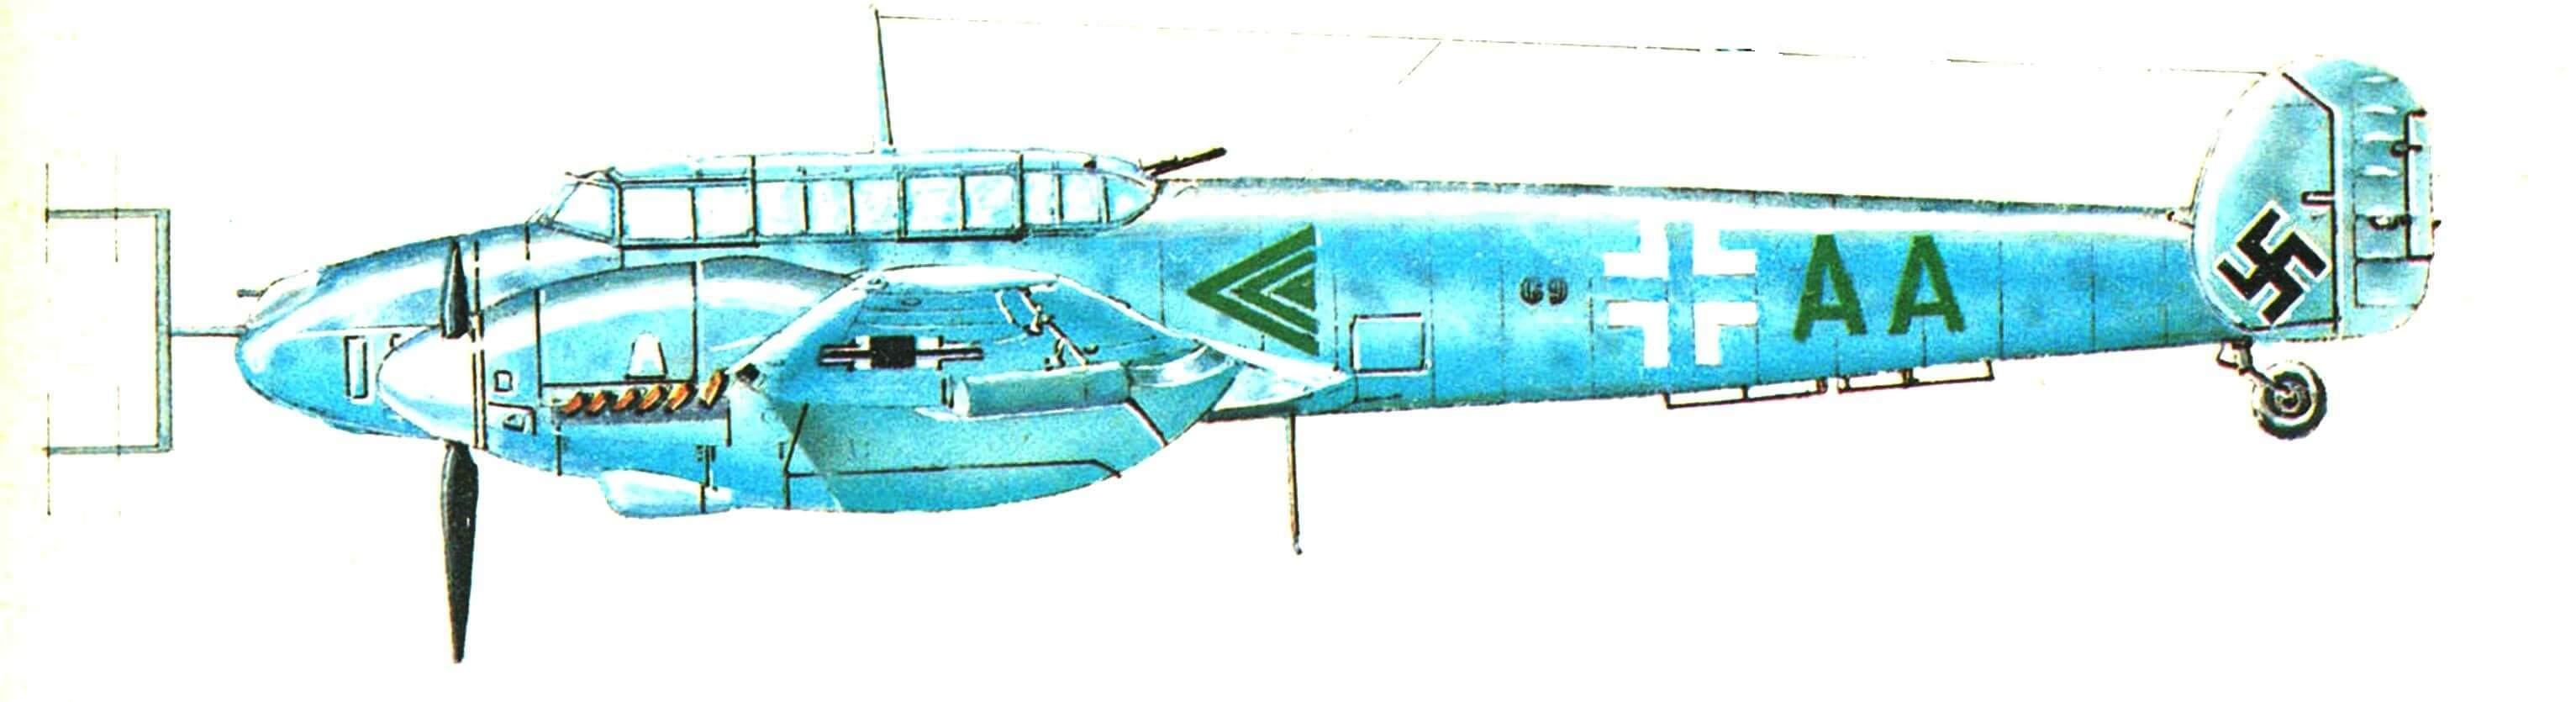 Messerschmitt BF 110 D-0, нa котором летал генерал Эрнст Удет.